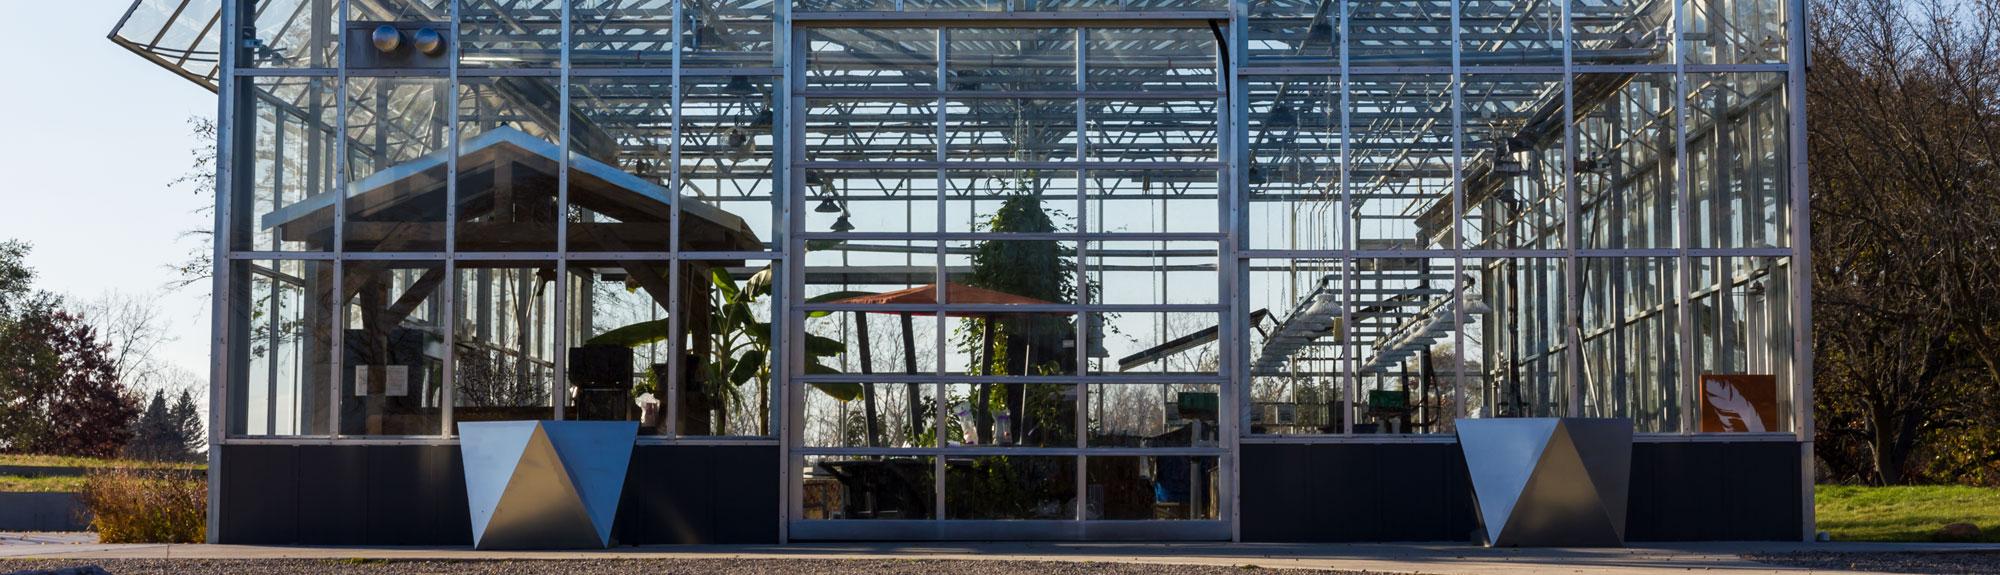 The Greenhouse at Robin Hills Farm